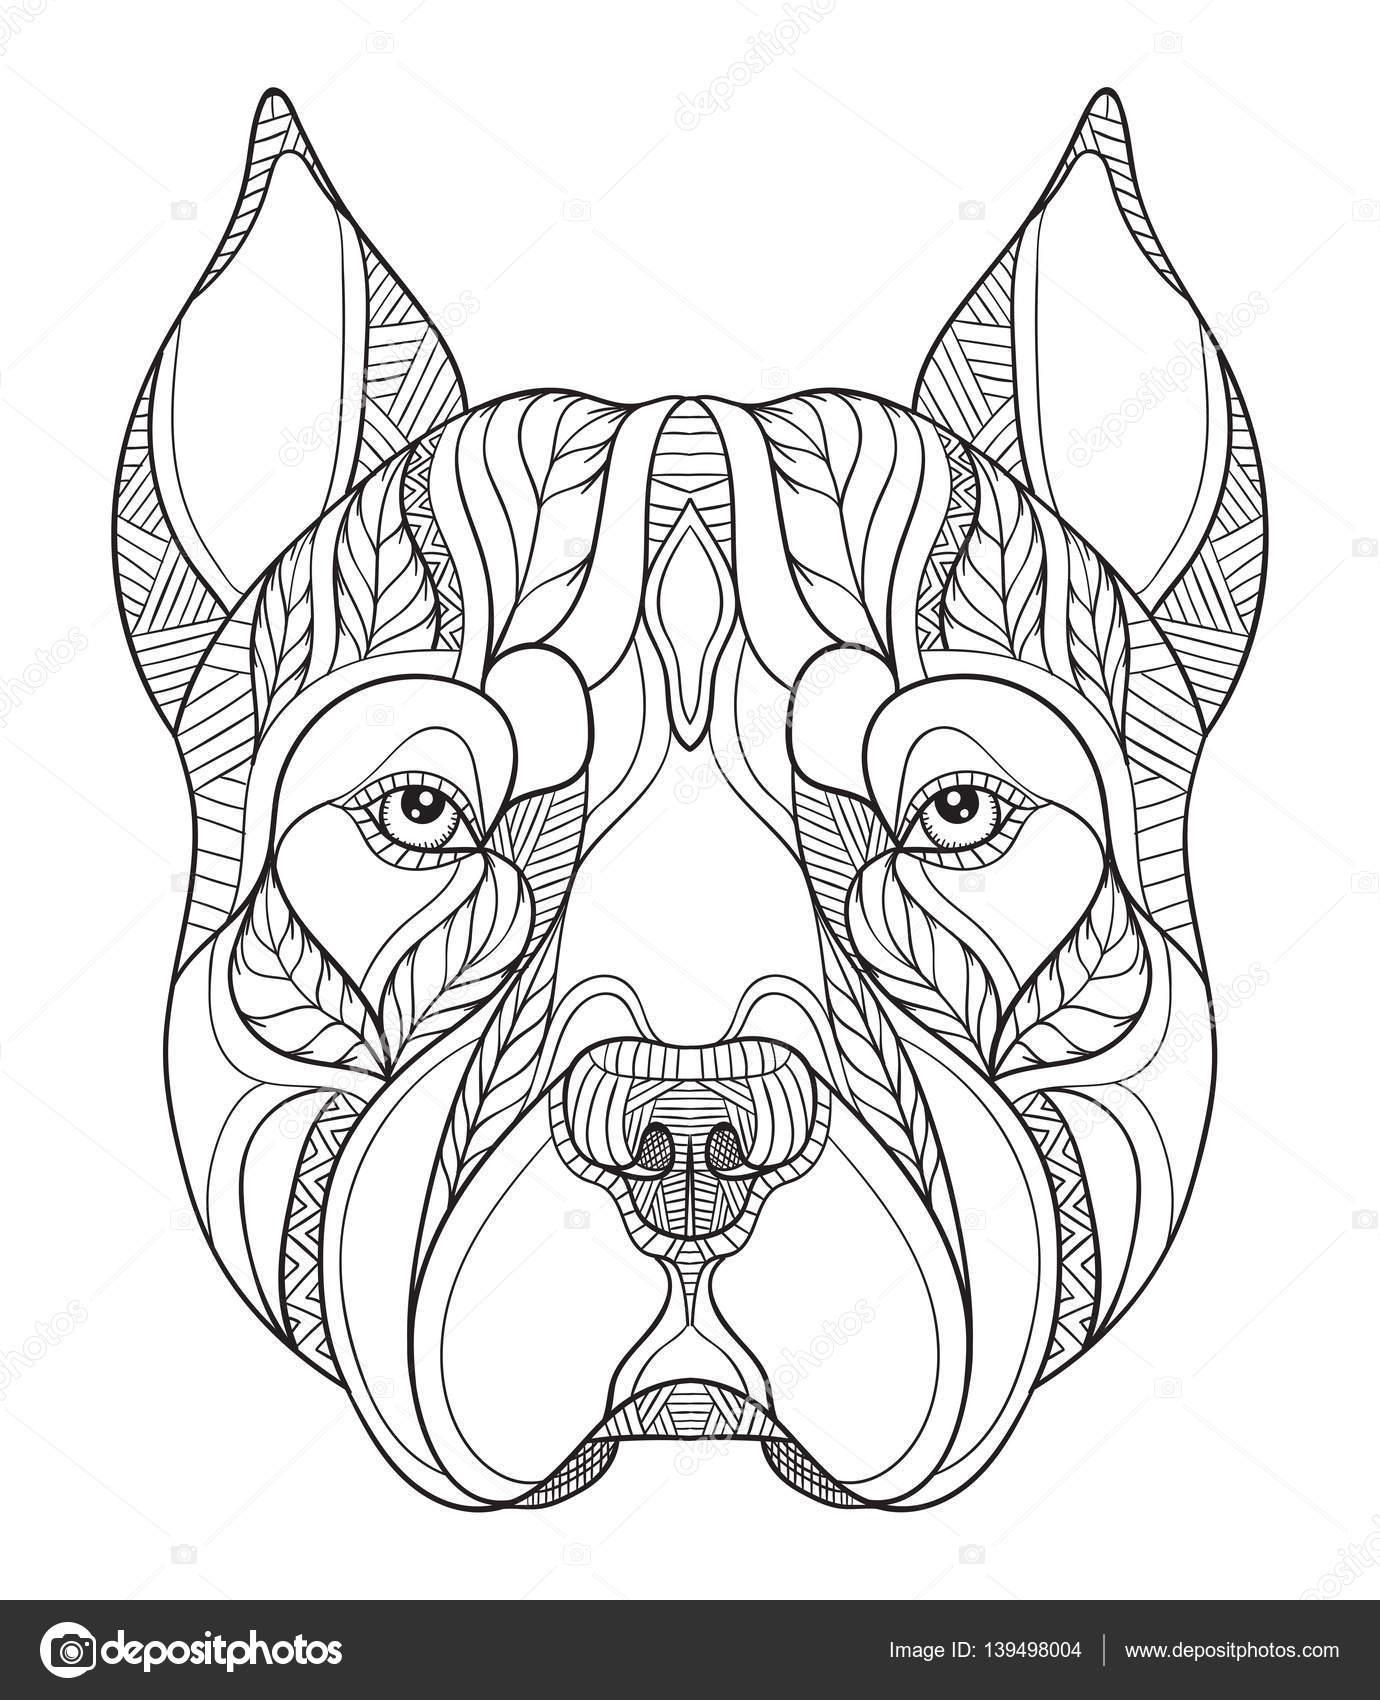 Pit bull terrier zentangle cabeça estilizada, vetorial